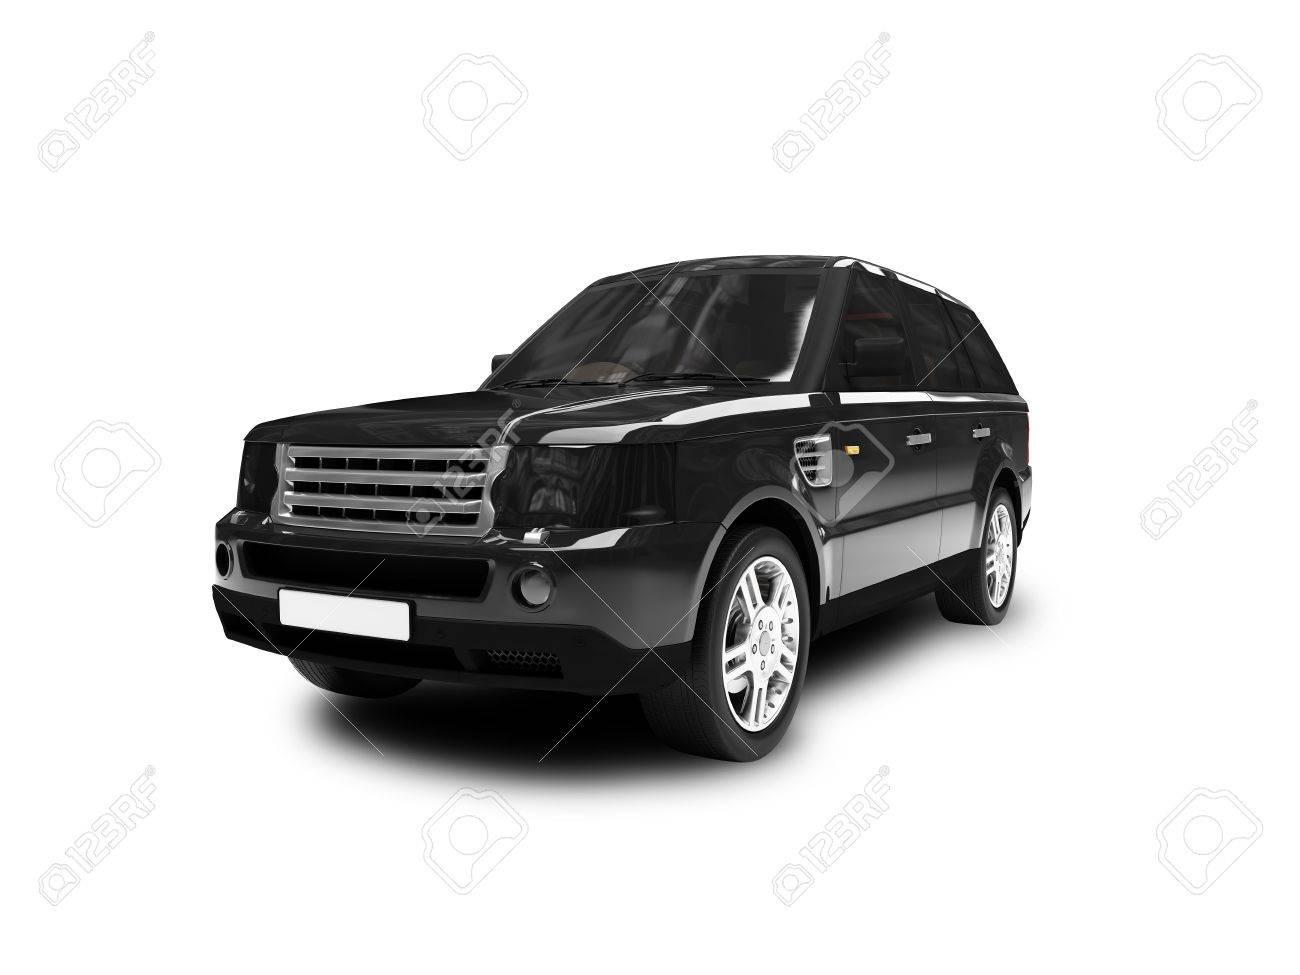 black car on a white background Stock Photo - 1214708